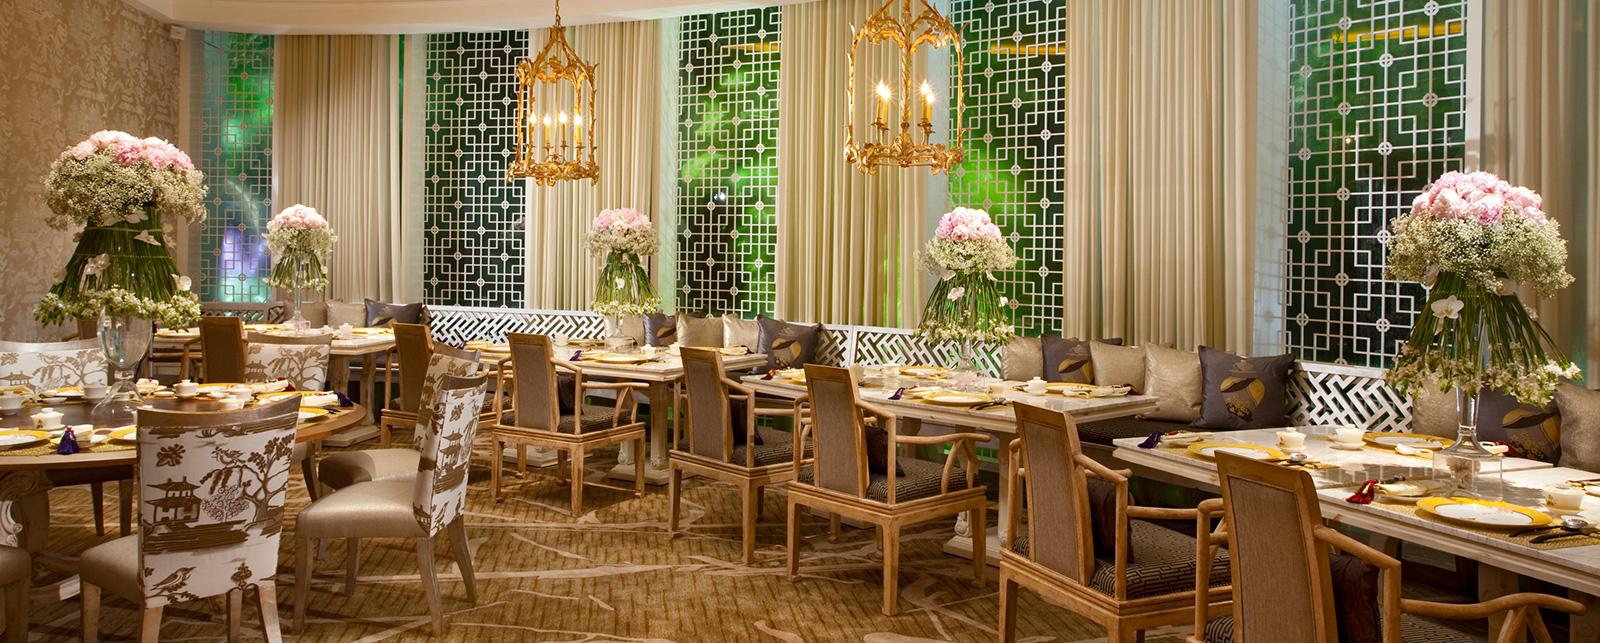 Table8 - Authentic Chinese Cuisine | Hotel Mulia Senayan ...